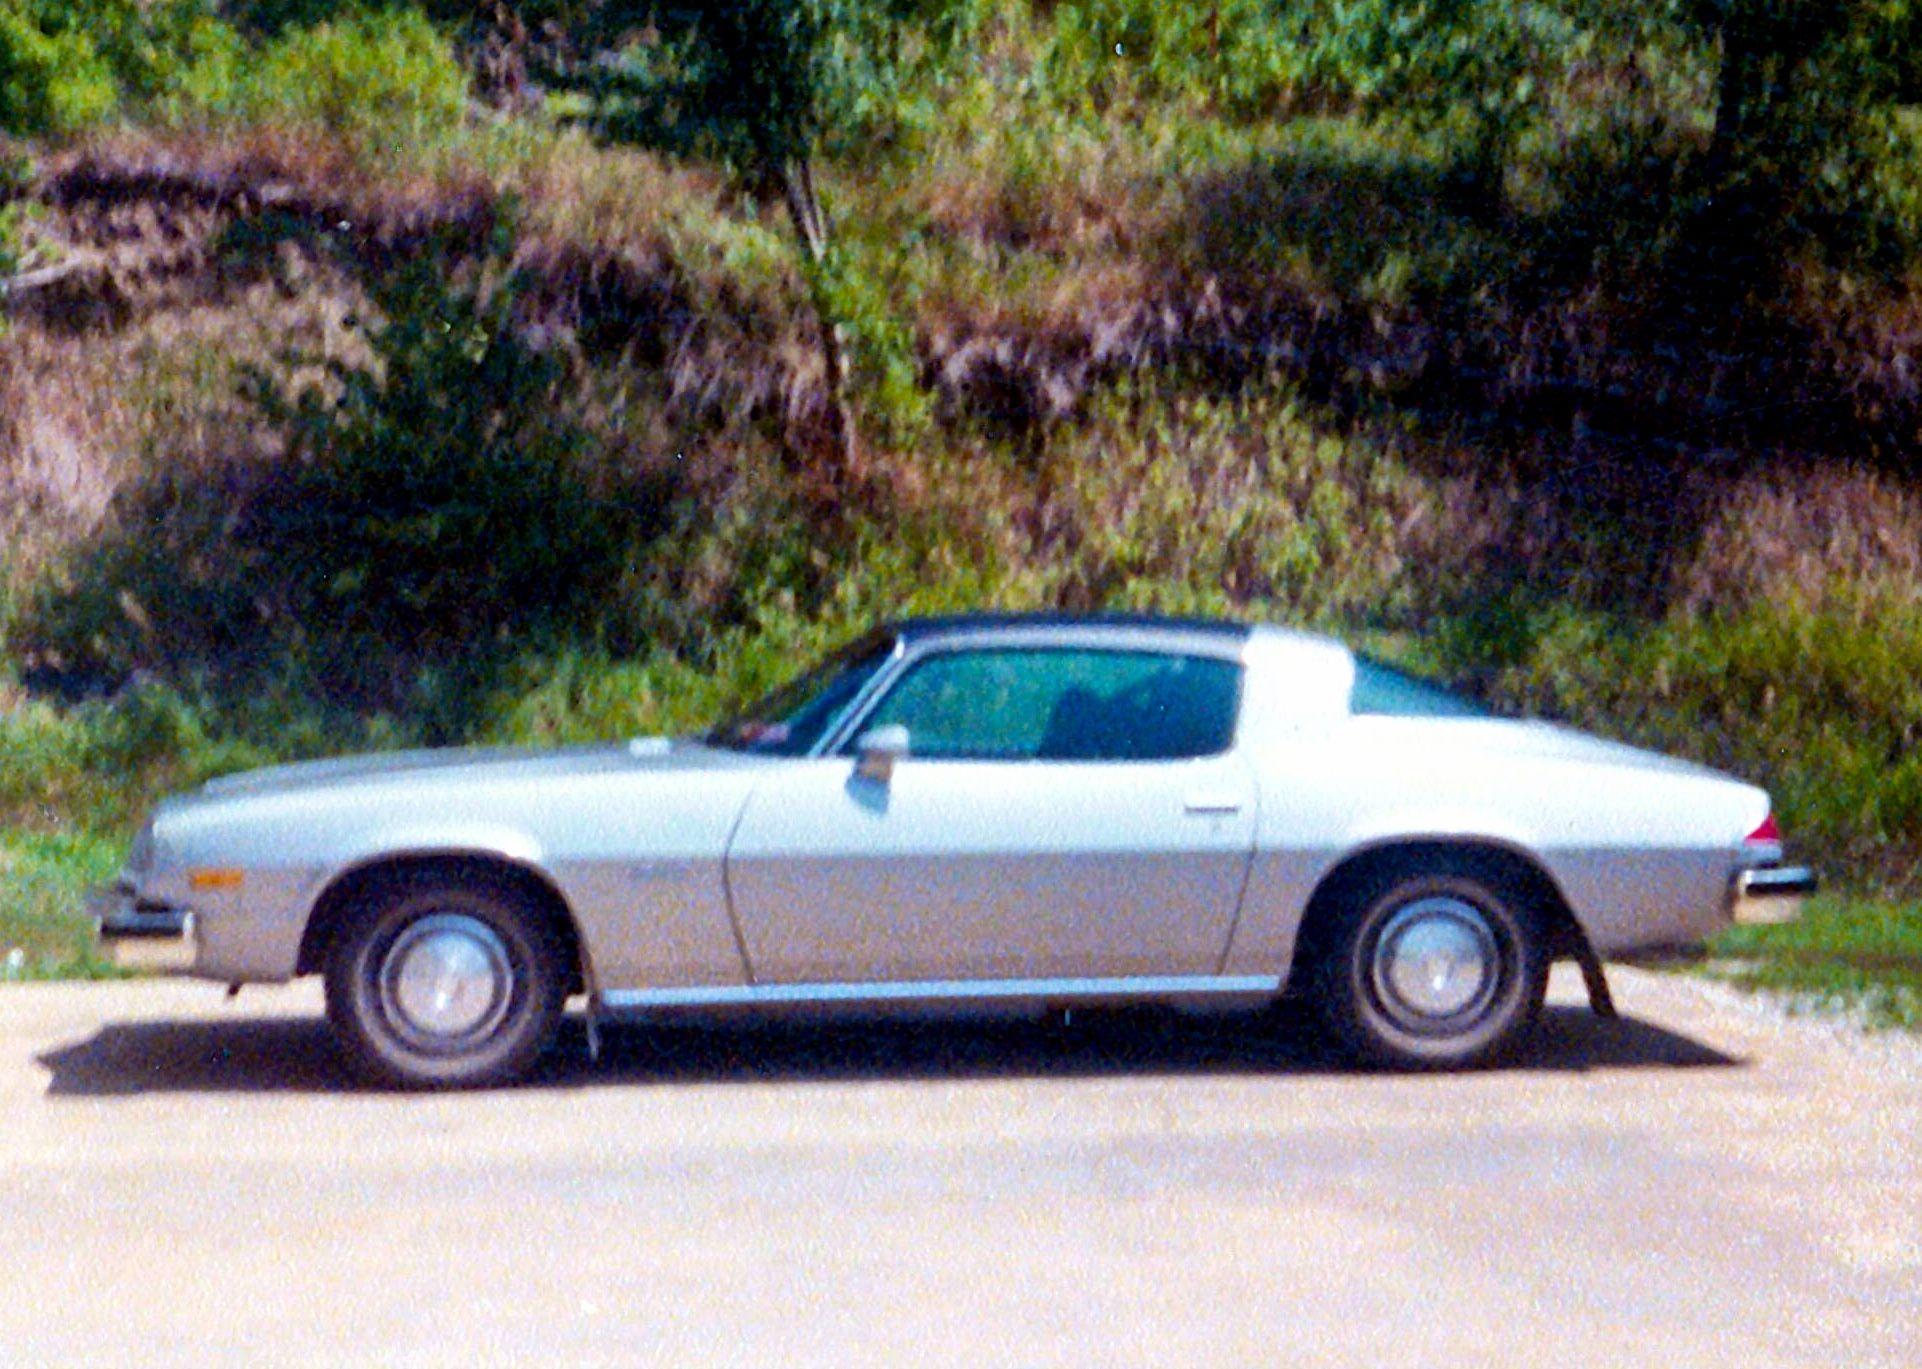 My 1976 Camaro Got It For My Sweet 16 It Had A Black Vinyl Top With A Silver Body 1976 Camaro Black Vinyl Camaro